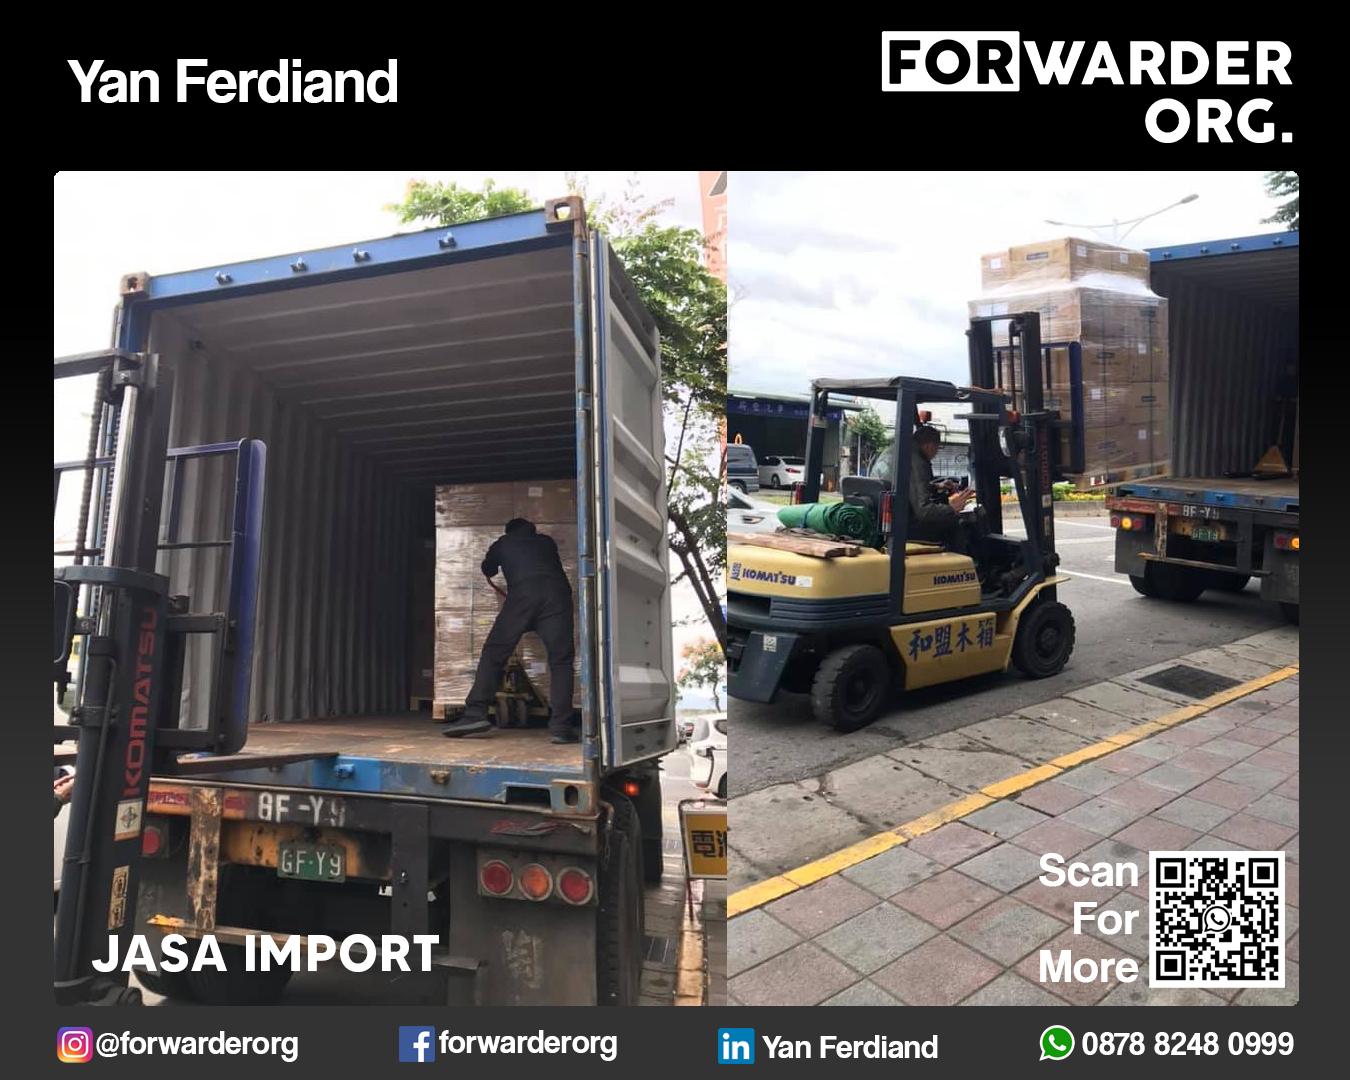 Jasa Import Mesin dan Sparepartnya FCL dan LCL | FORWARDER ORG